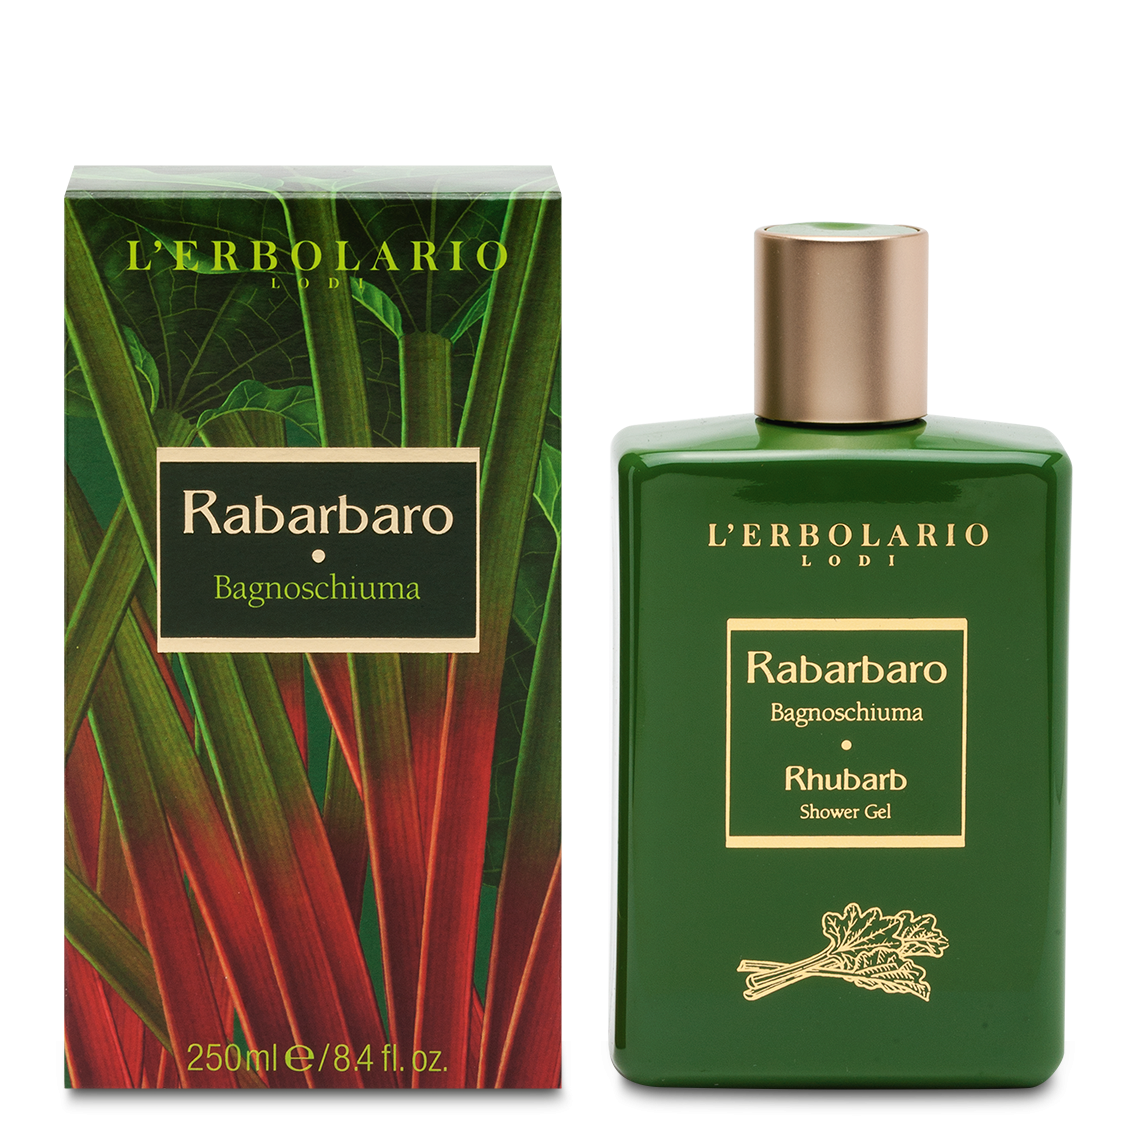 Bagnoschiuma Rabarbaro